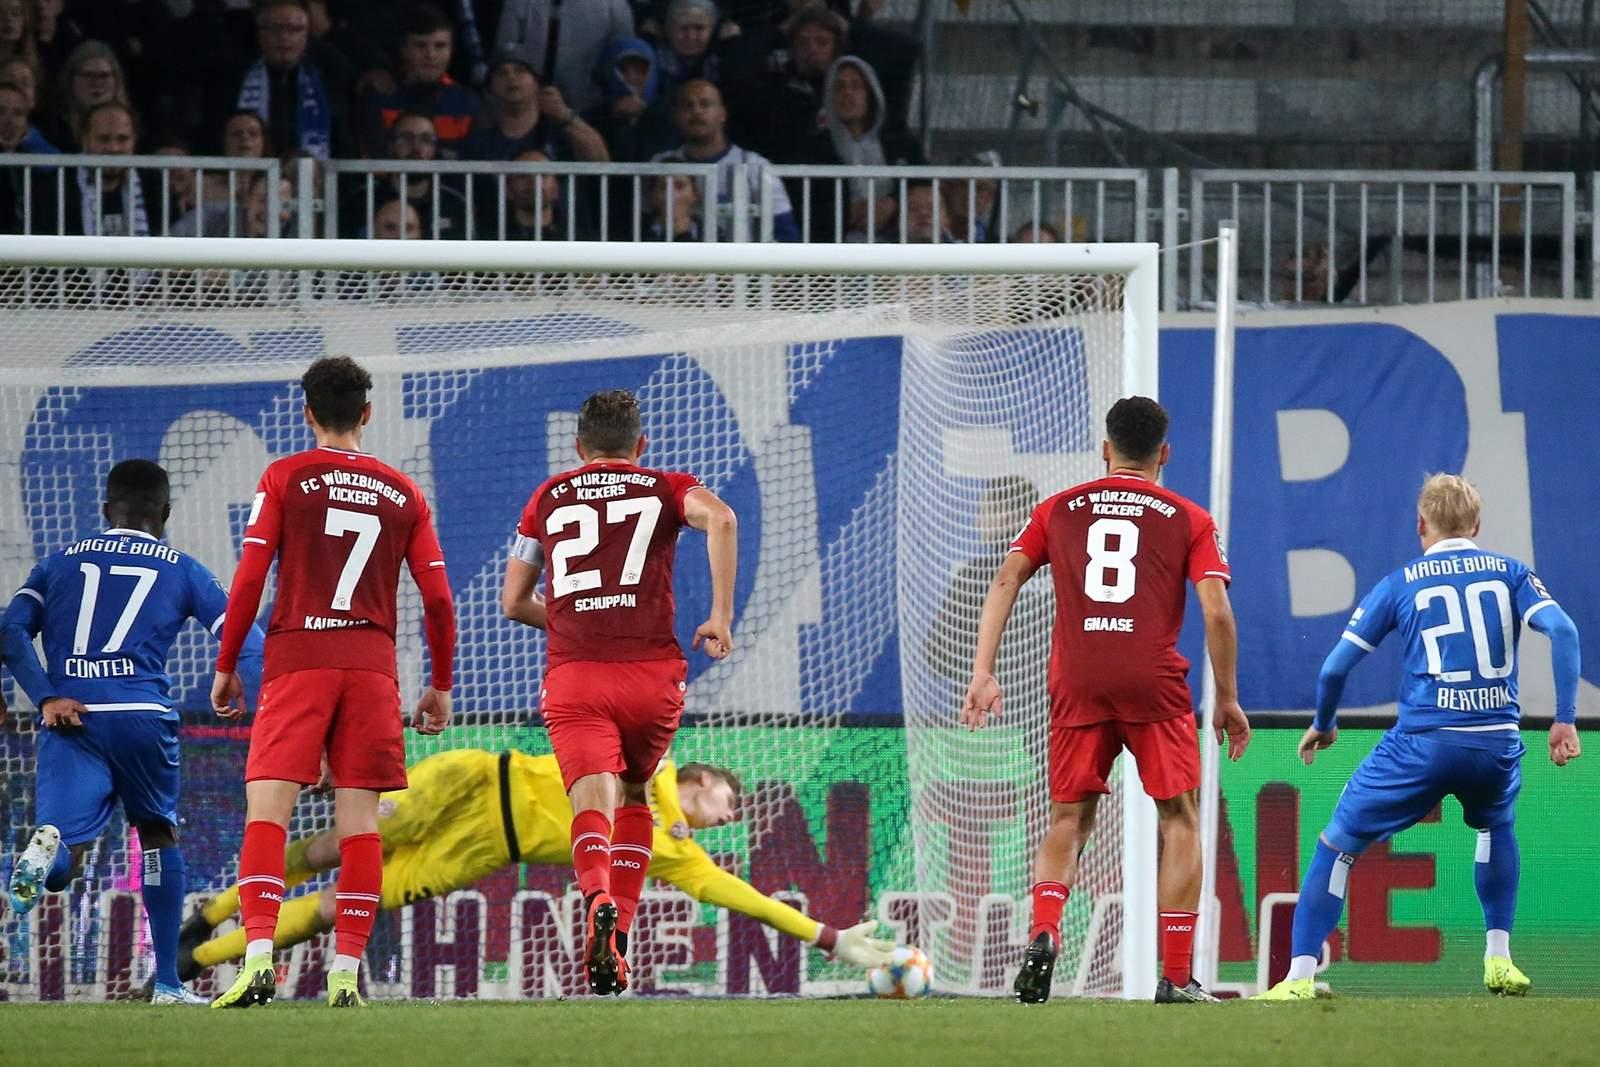 Sören Bertram trifft per Elfmeter gegen Würzburg